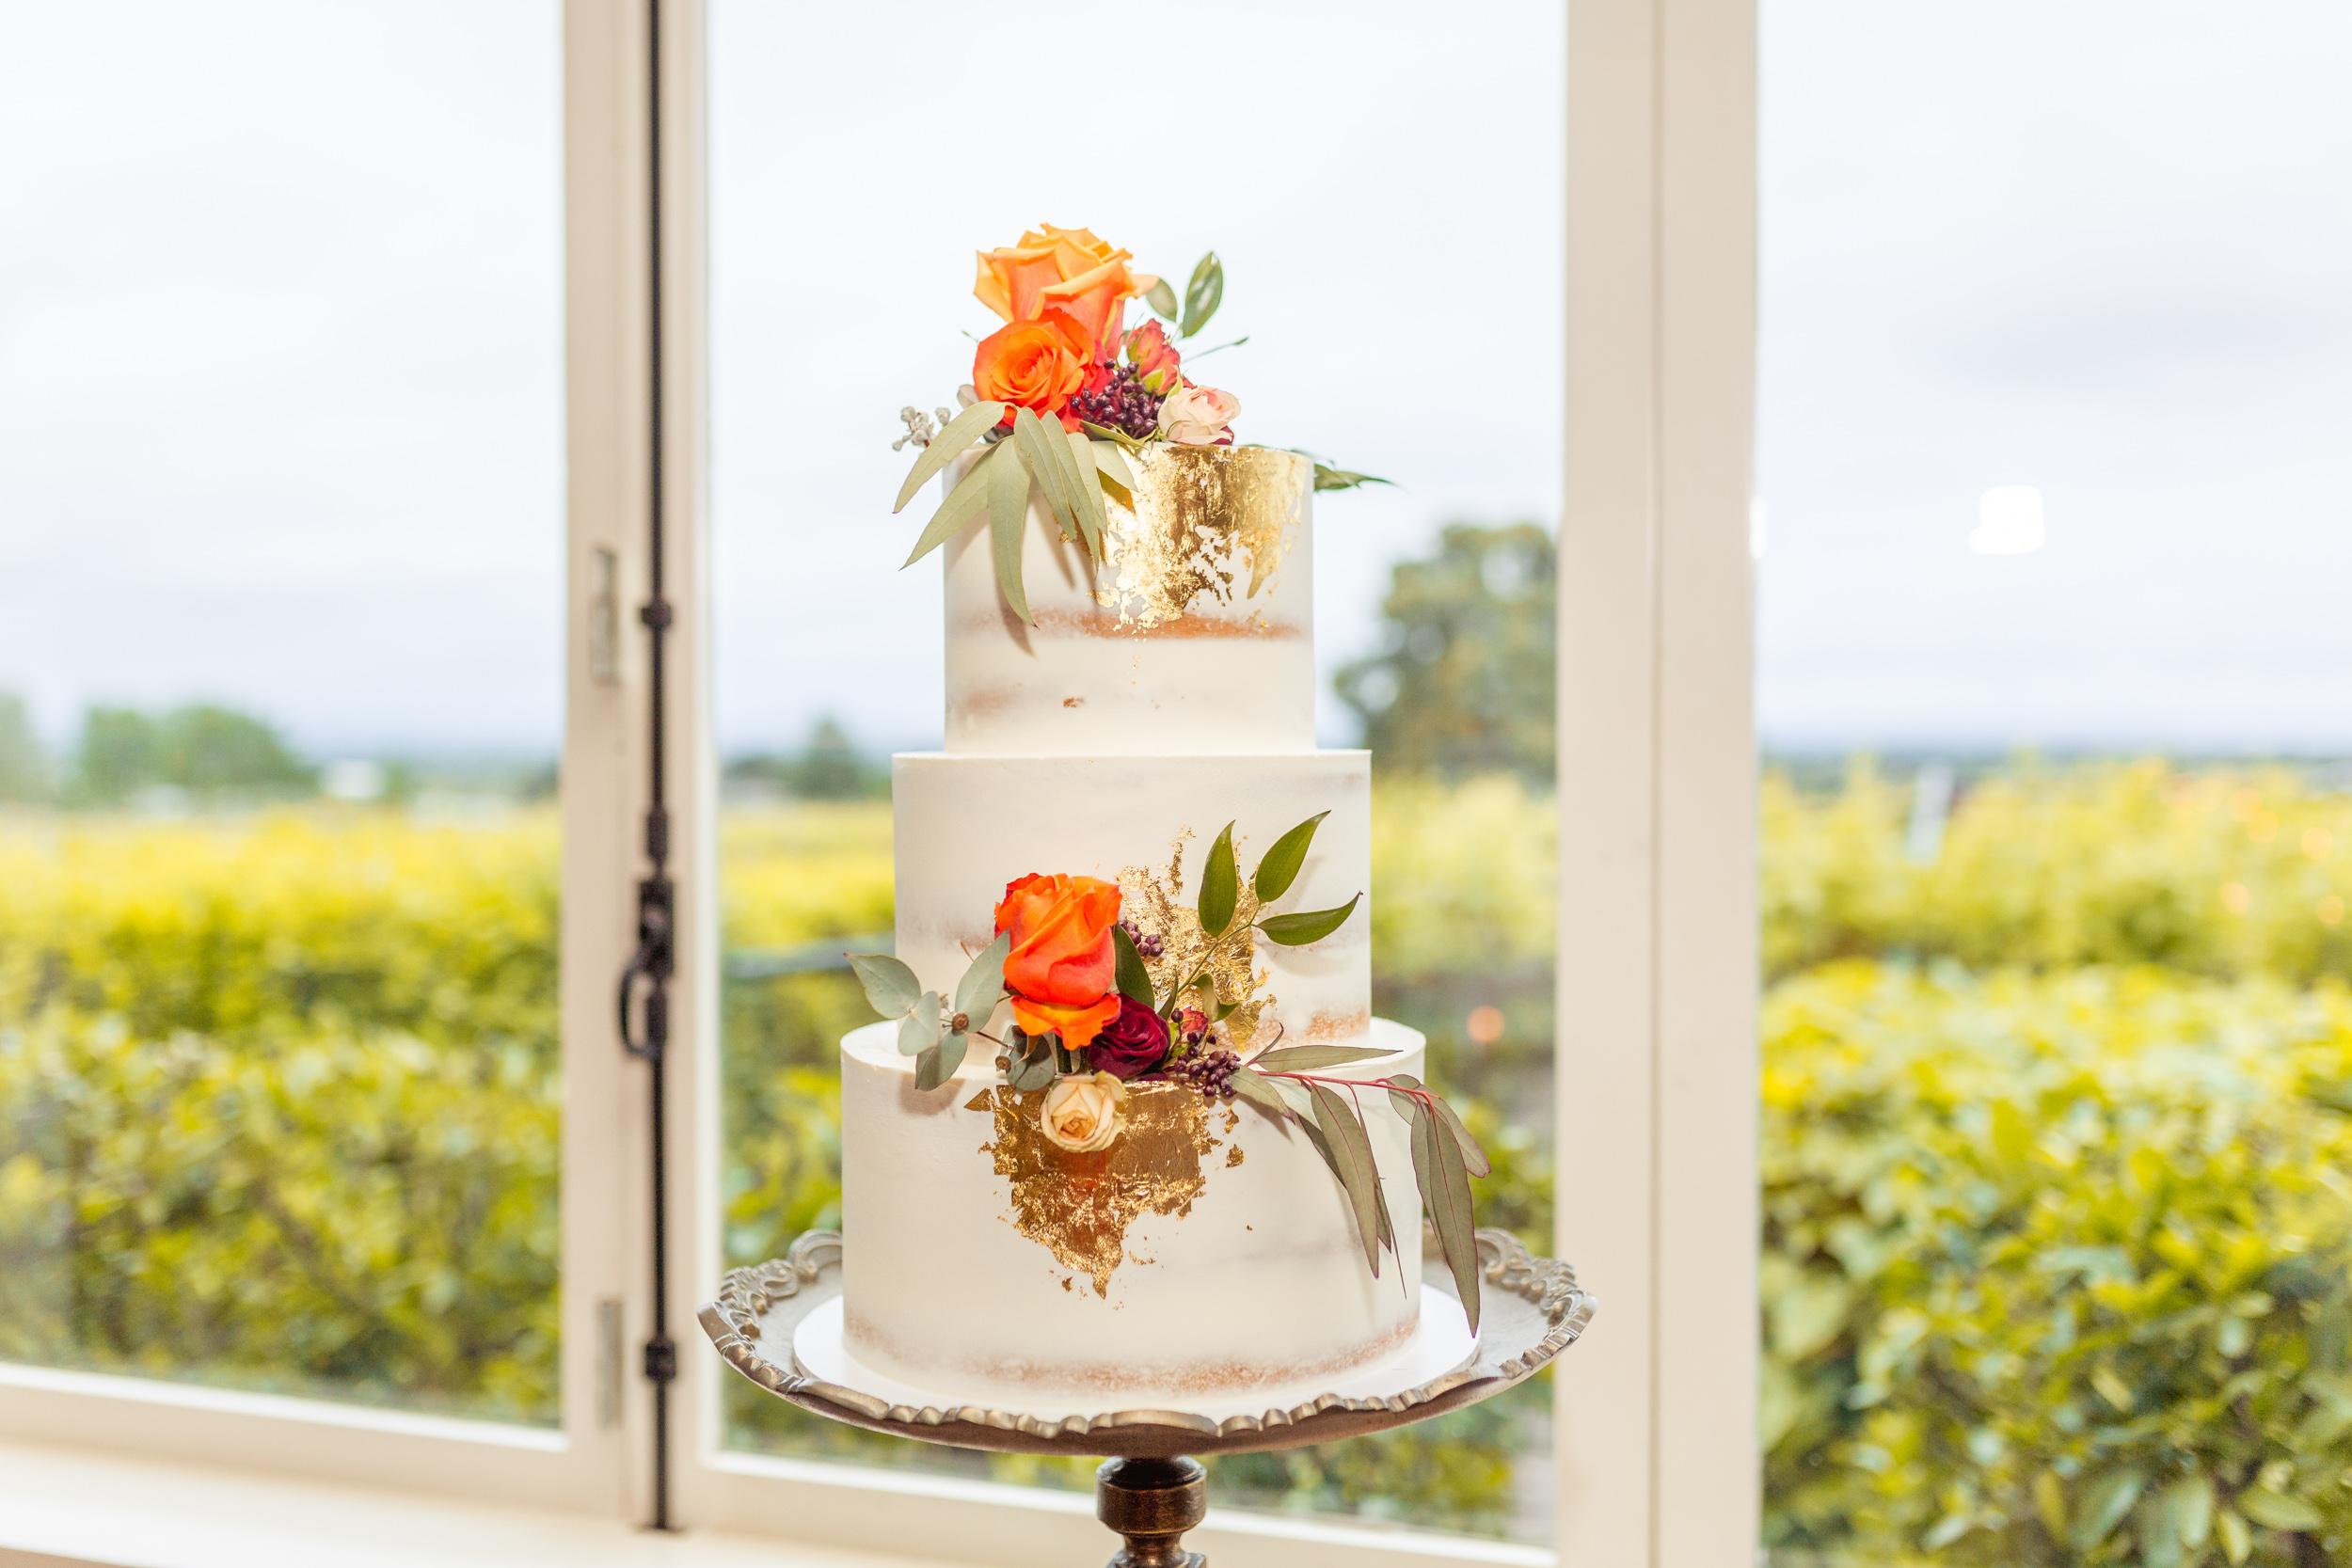 pretty-little-details-hawkes-bay-wedding-cakes